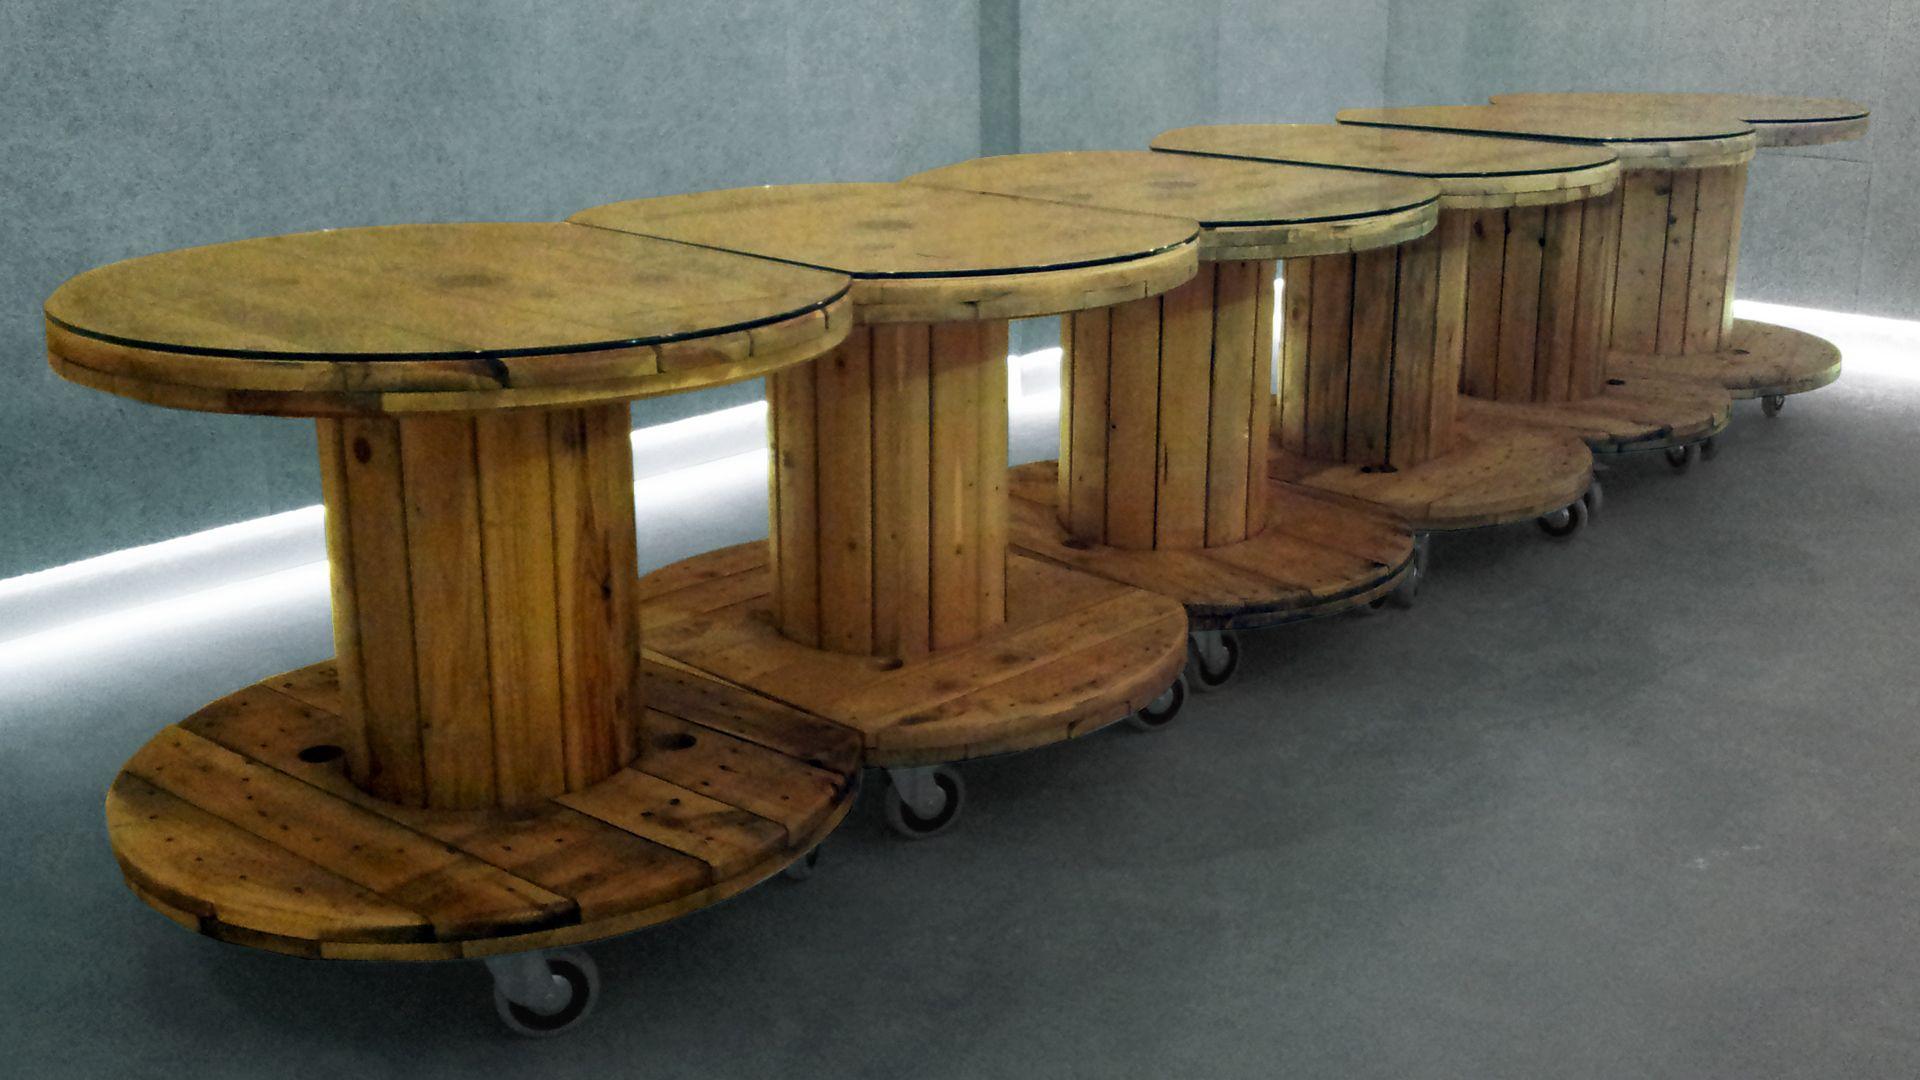 Mesa carrete ping pong arquitectura proyectos para el - Mesas de arquitectura ...